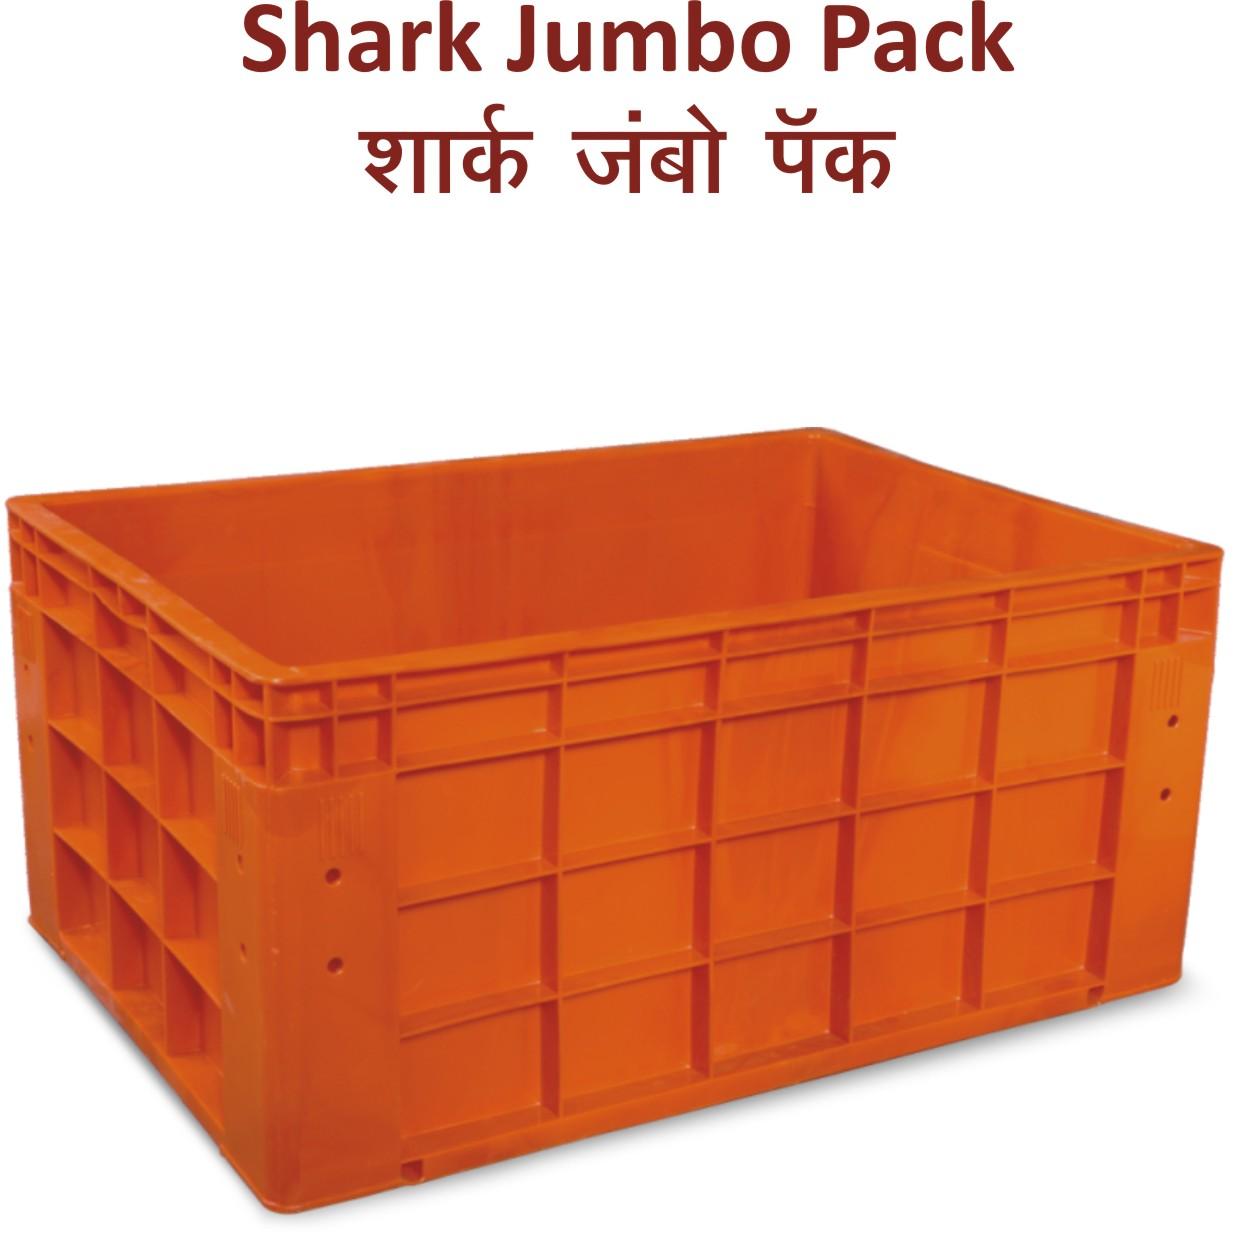 crate shark jumbo pack